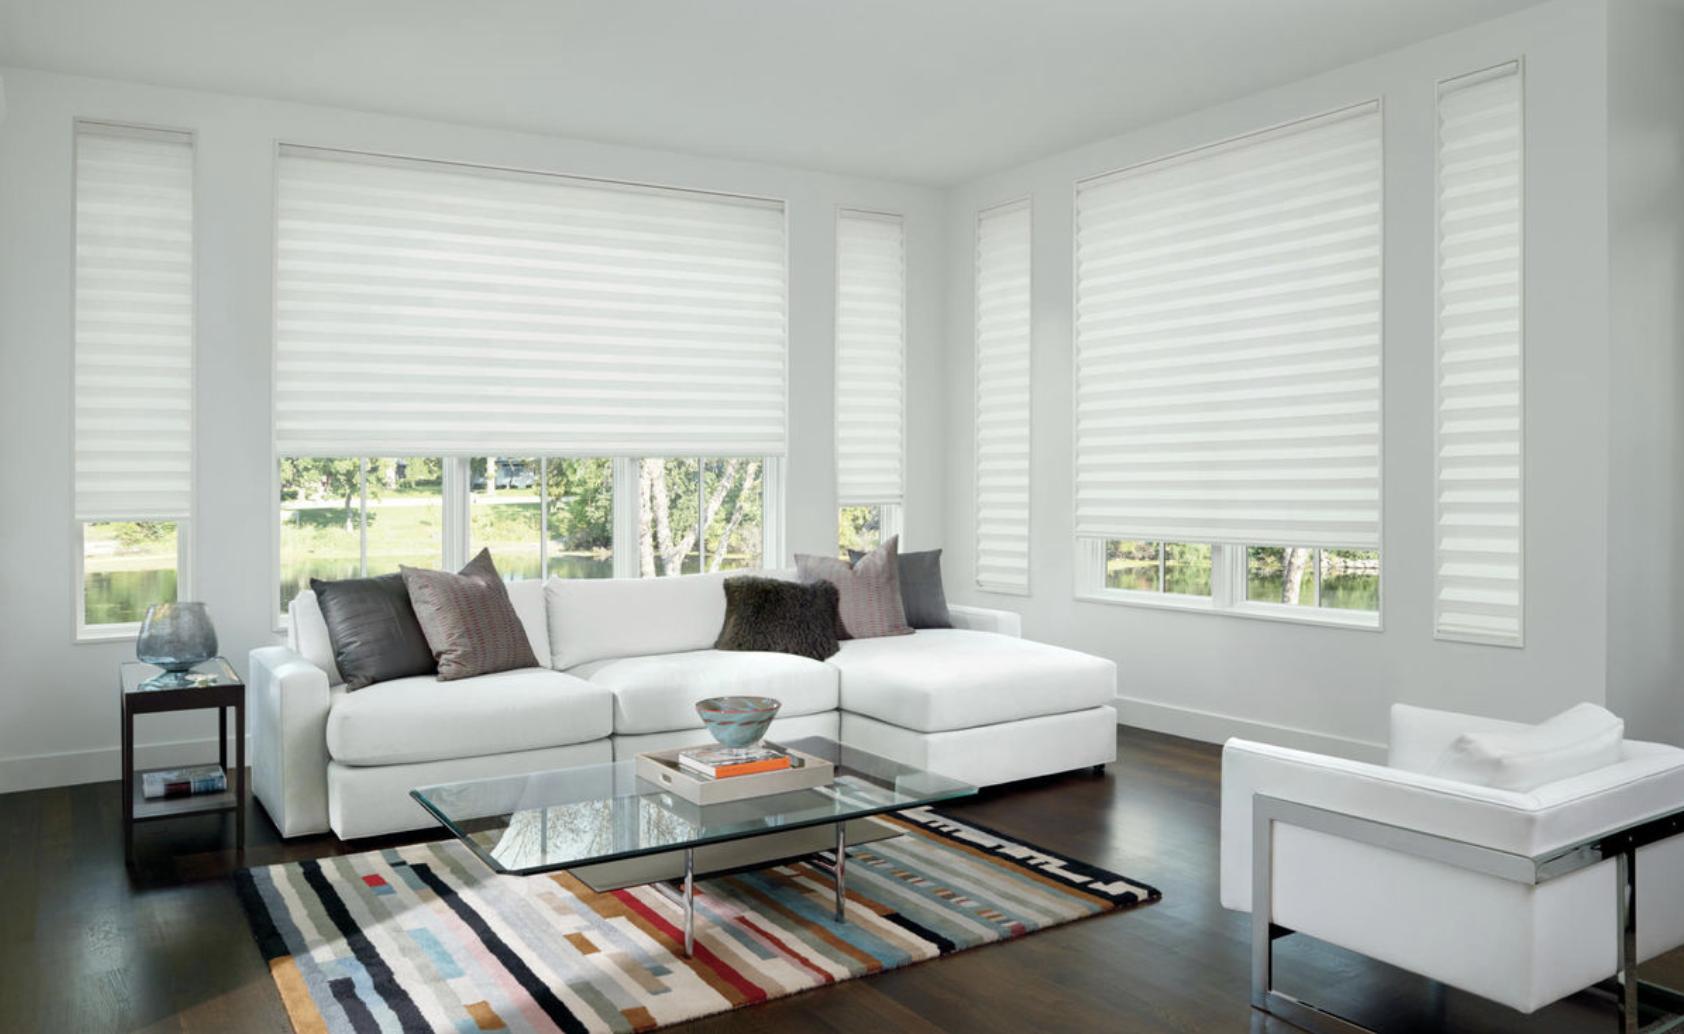 Solera Soft Roman Shades for Home Living Rooms Near Tustin, California (CA) to Insulate Windows